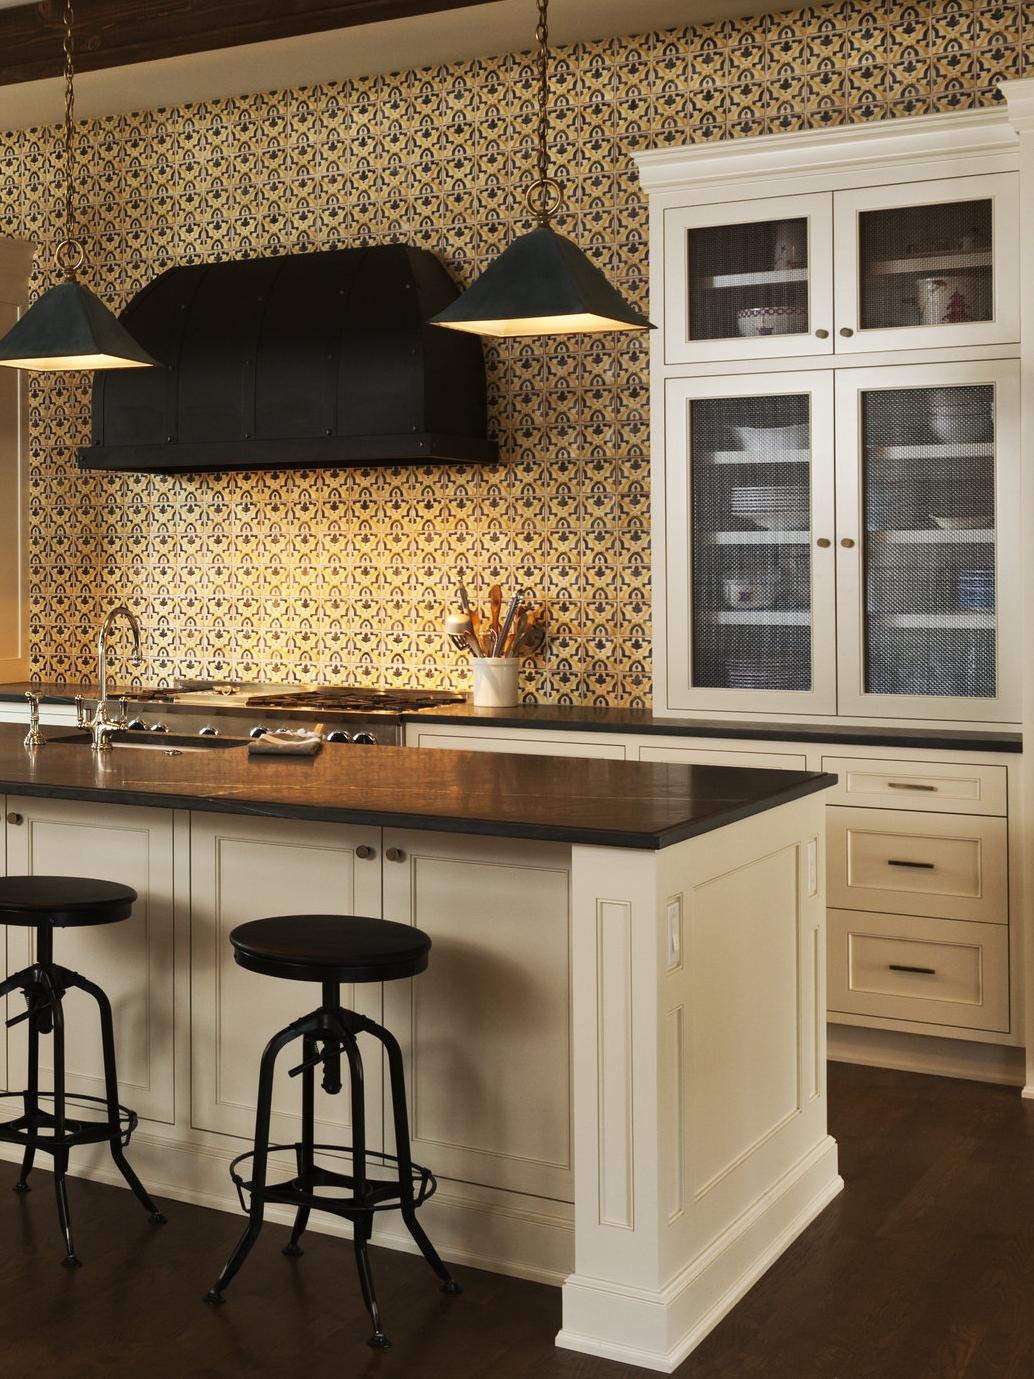 Greenwood Kitchen - Portland, Oregon